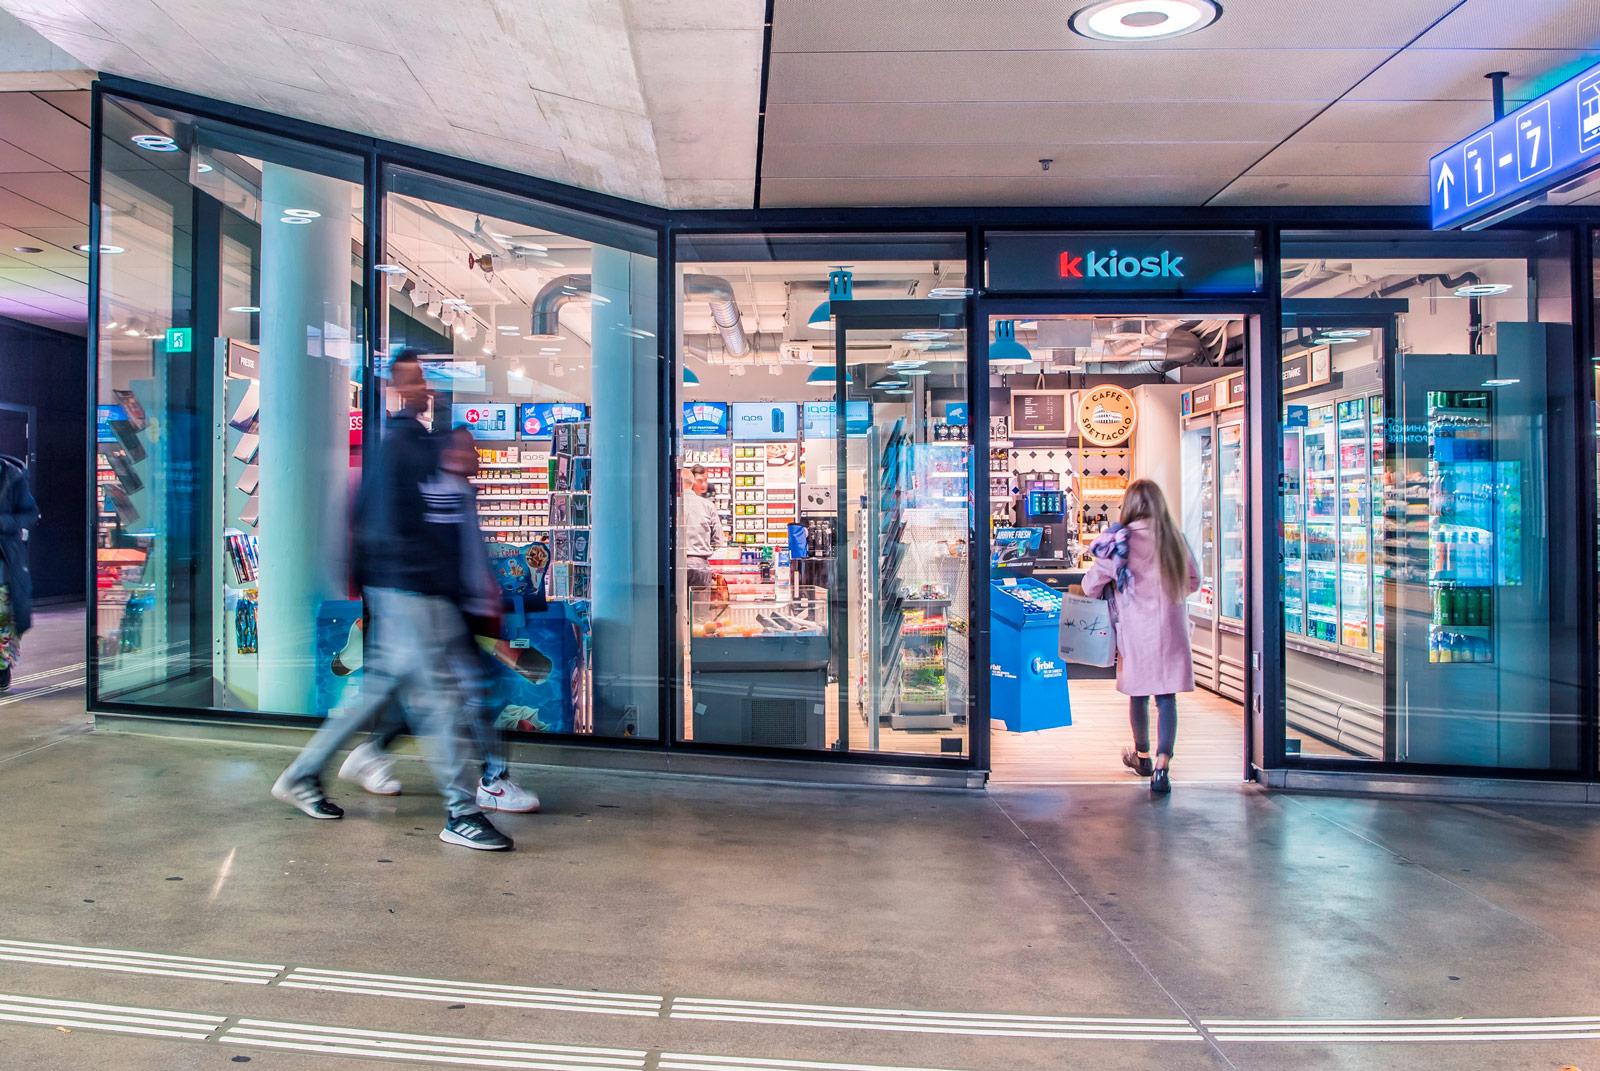 k kiosk, Valora, Retail, Convenience, Mehr Food